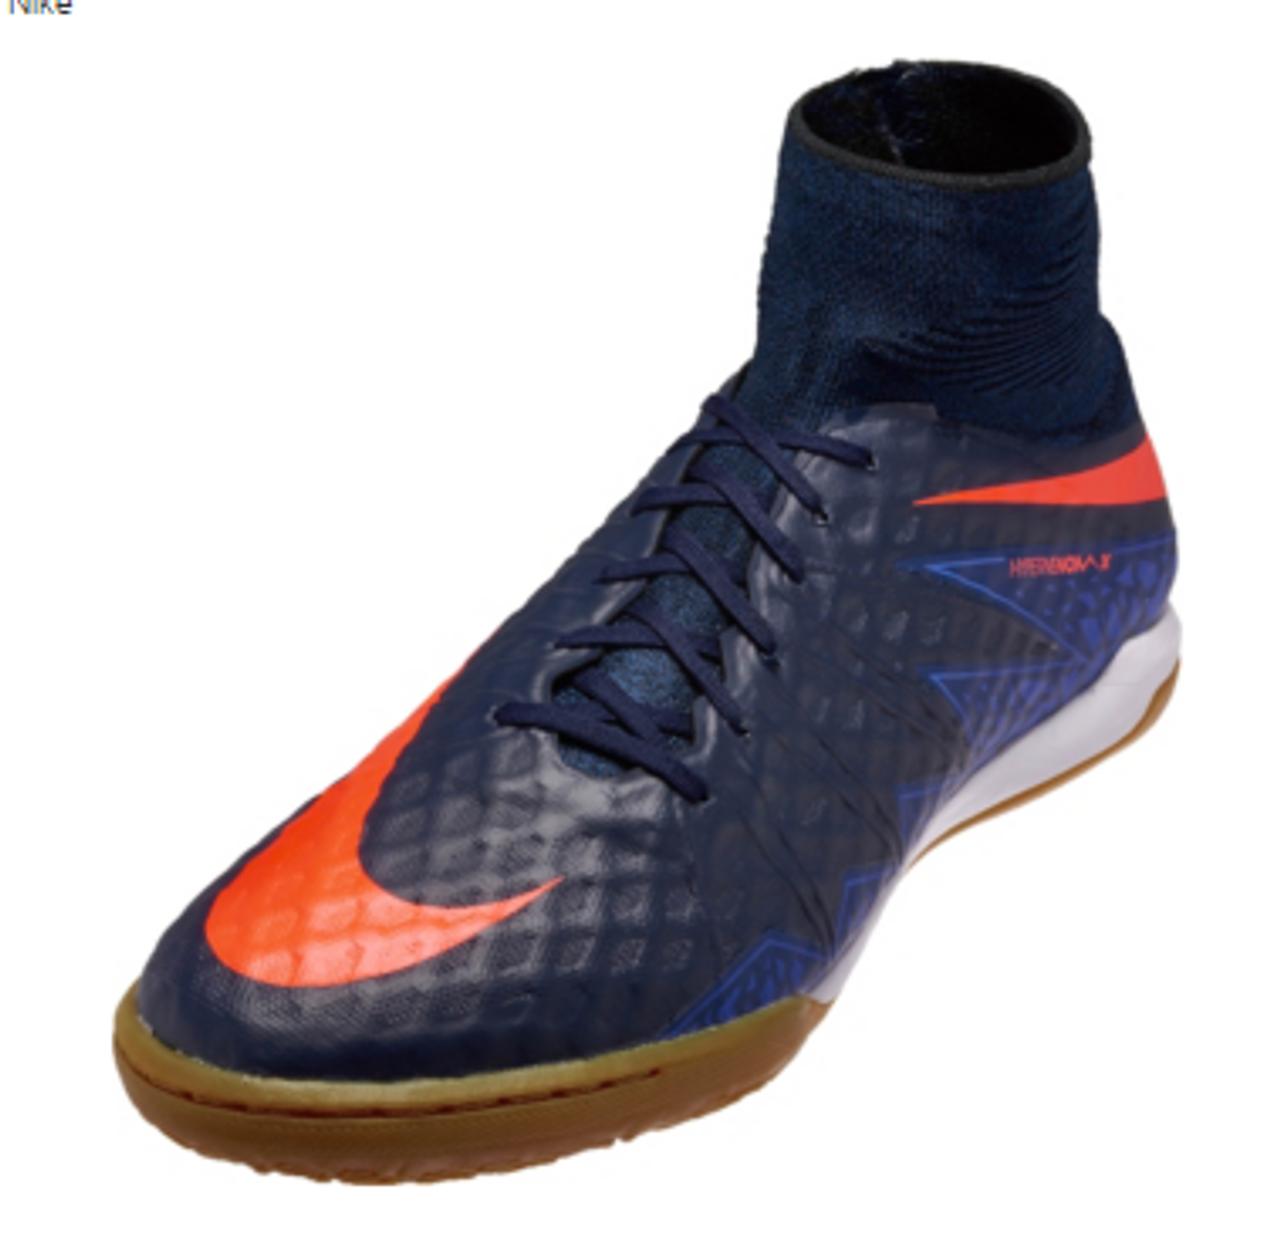 fd8a0866e Nike HypervenomX Proximo IC - Obsidian Coastal Blue Total Crimson ...